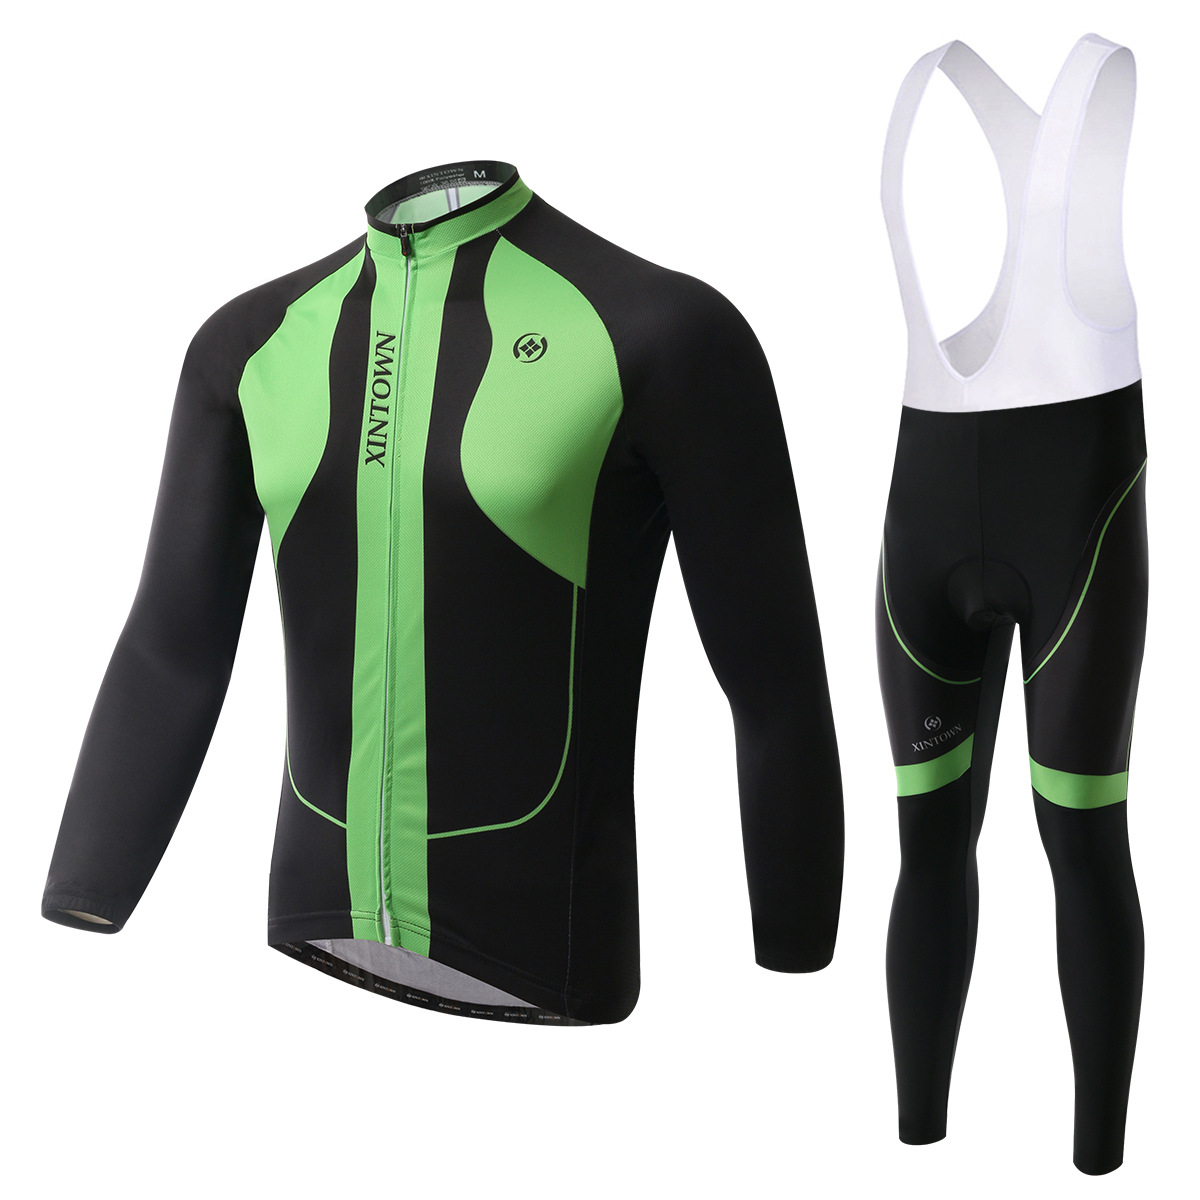 XINTOWN Dragon as green bike riding jersey strap long-sleeved suit wear bicycle suits fleece wind warm functional underwear